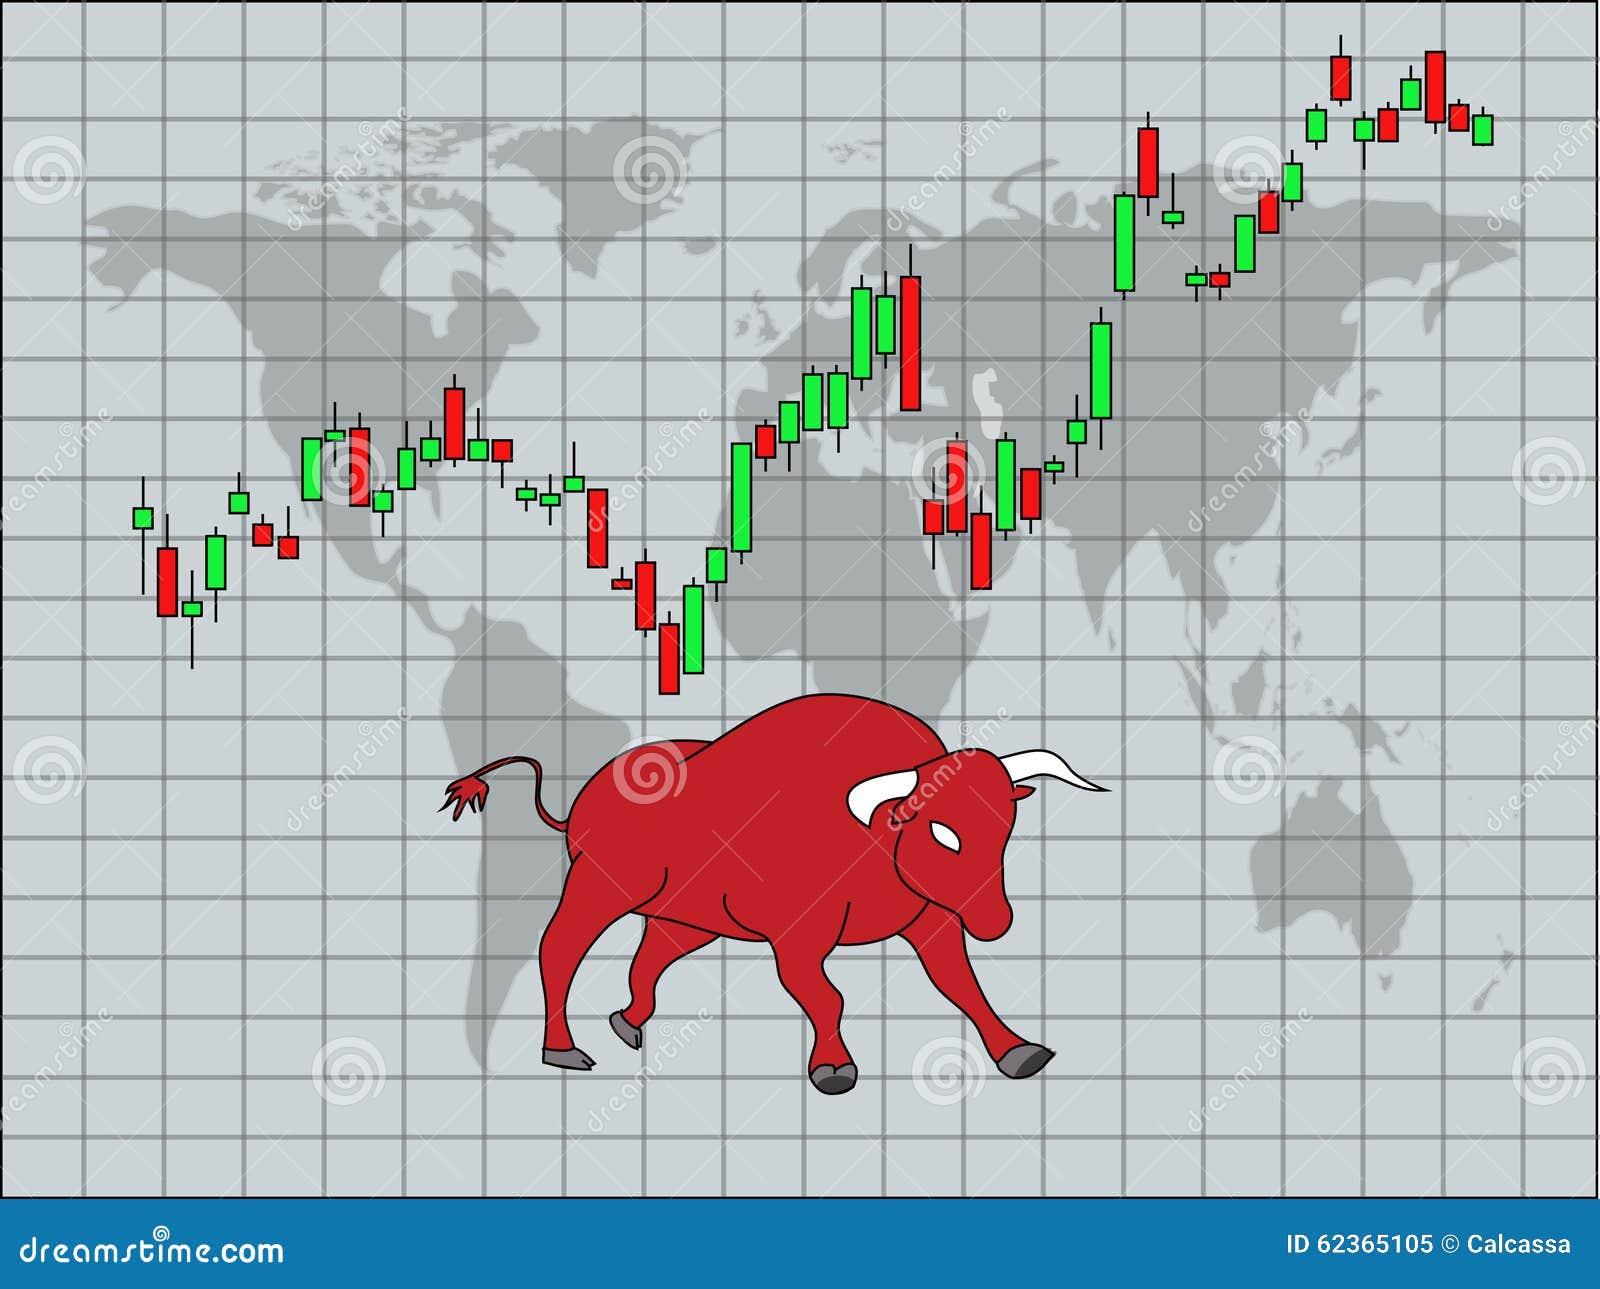 Bullish Symbols On Stock Market Vector Illustration Stock Vector